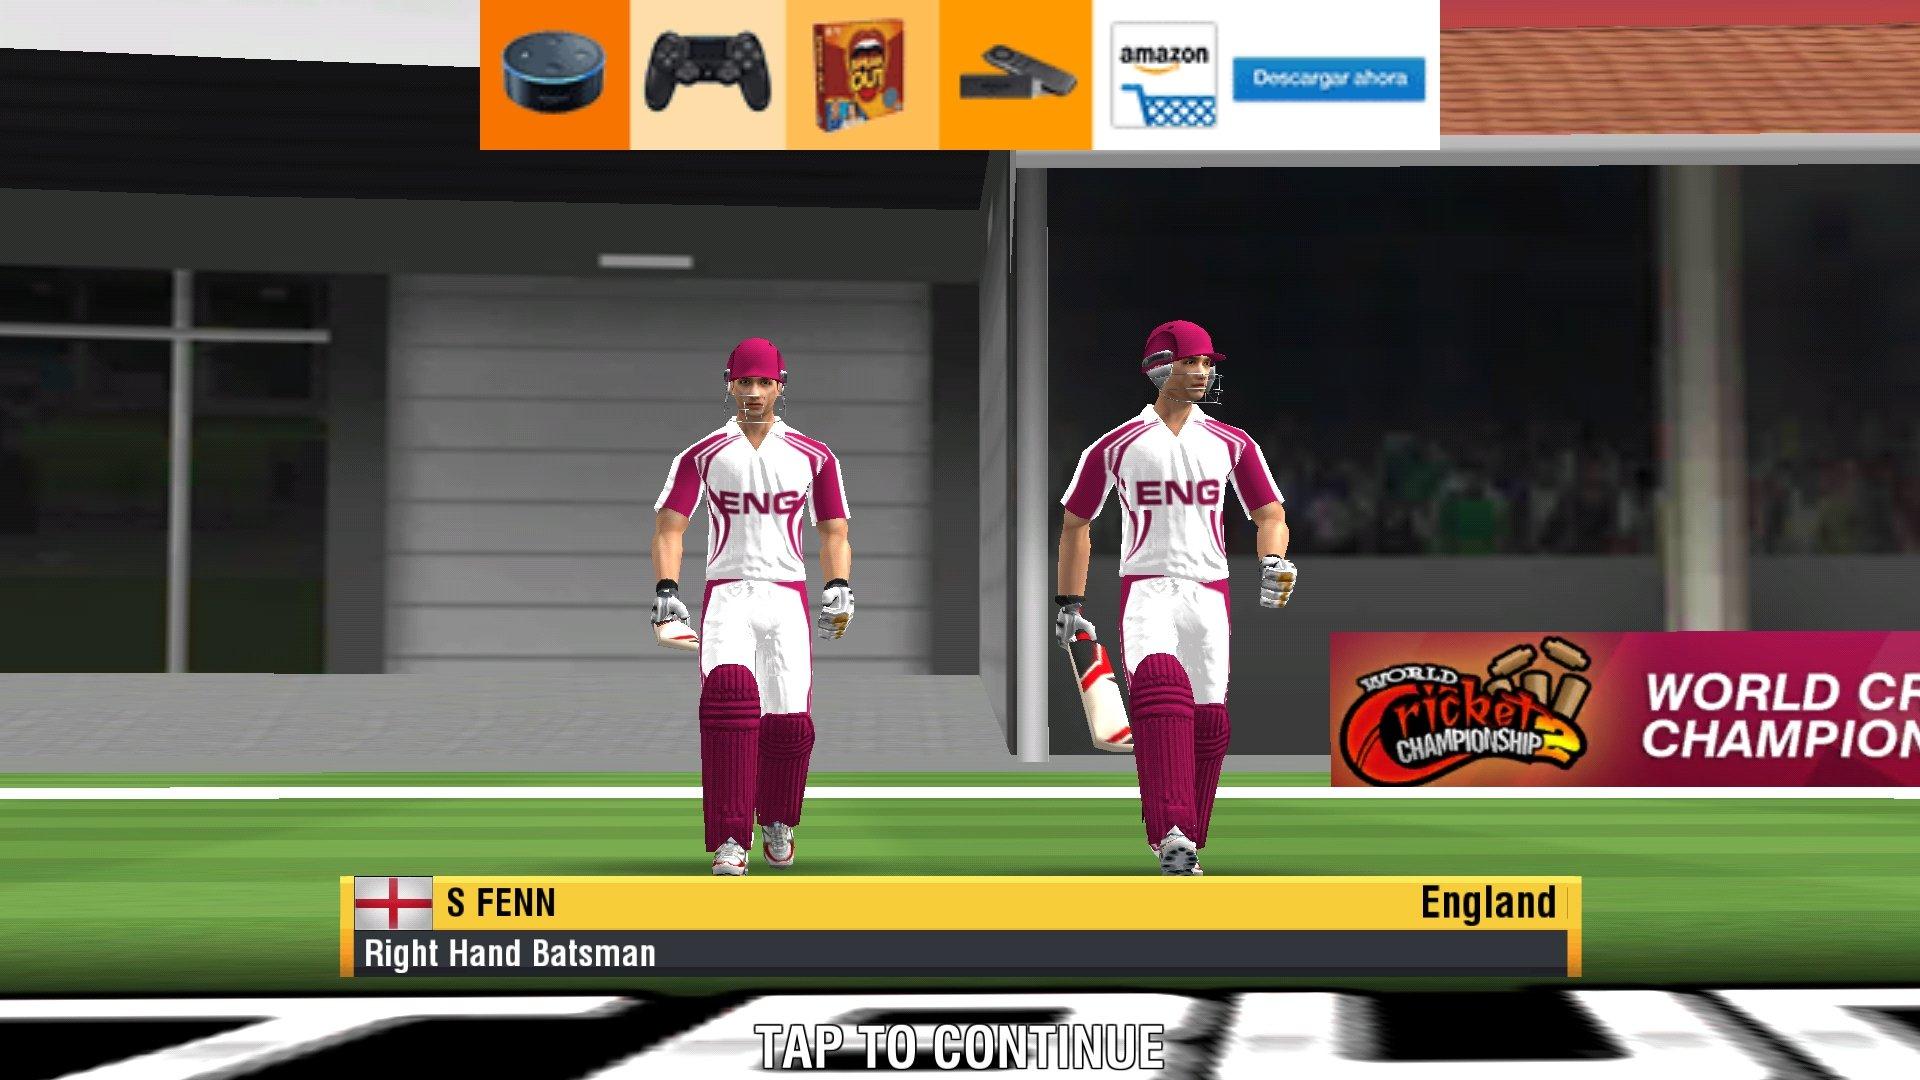 world cricket championship 2 hack apk mod download